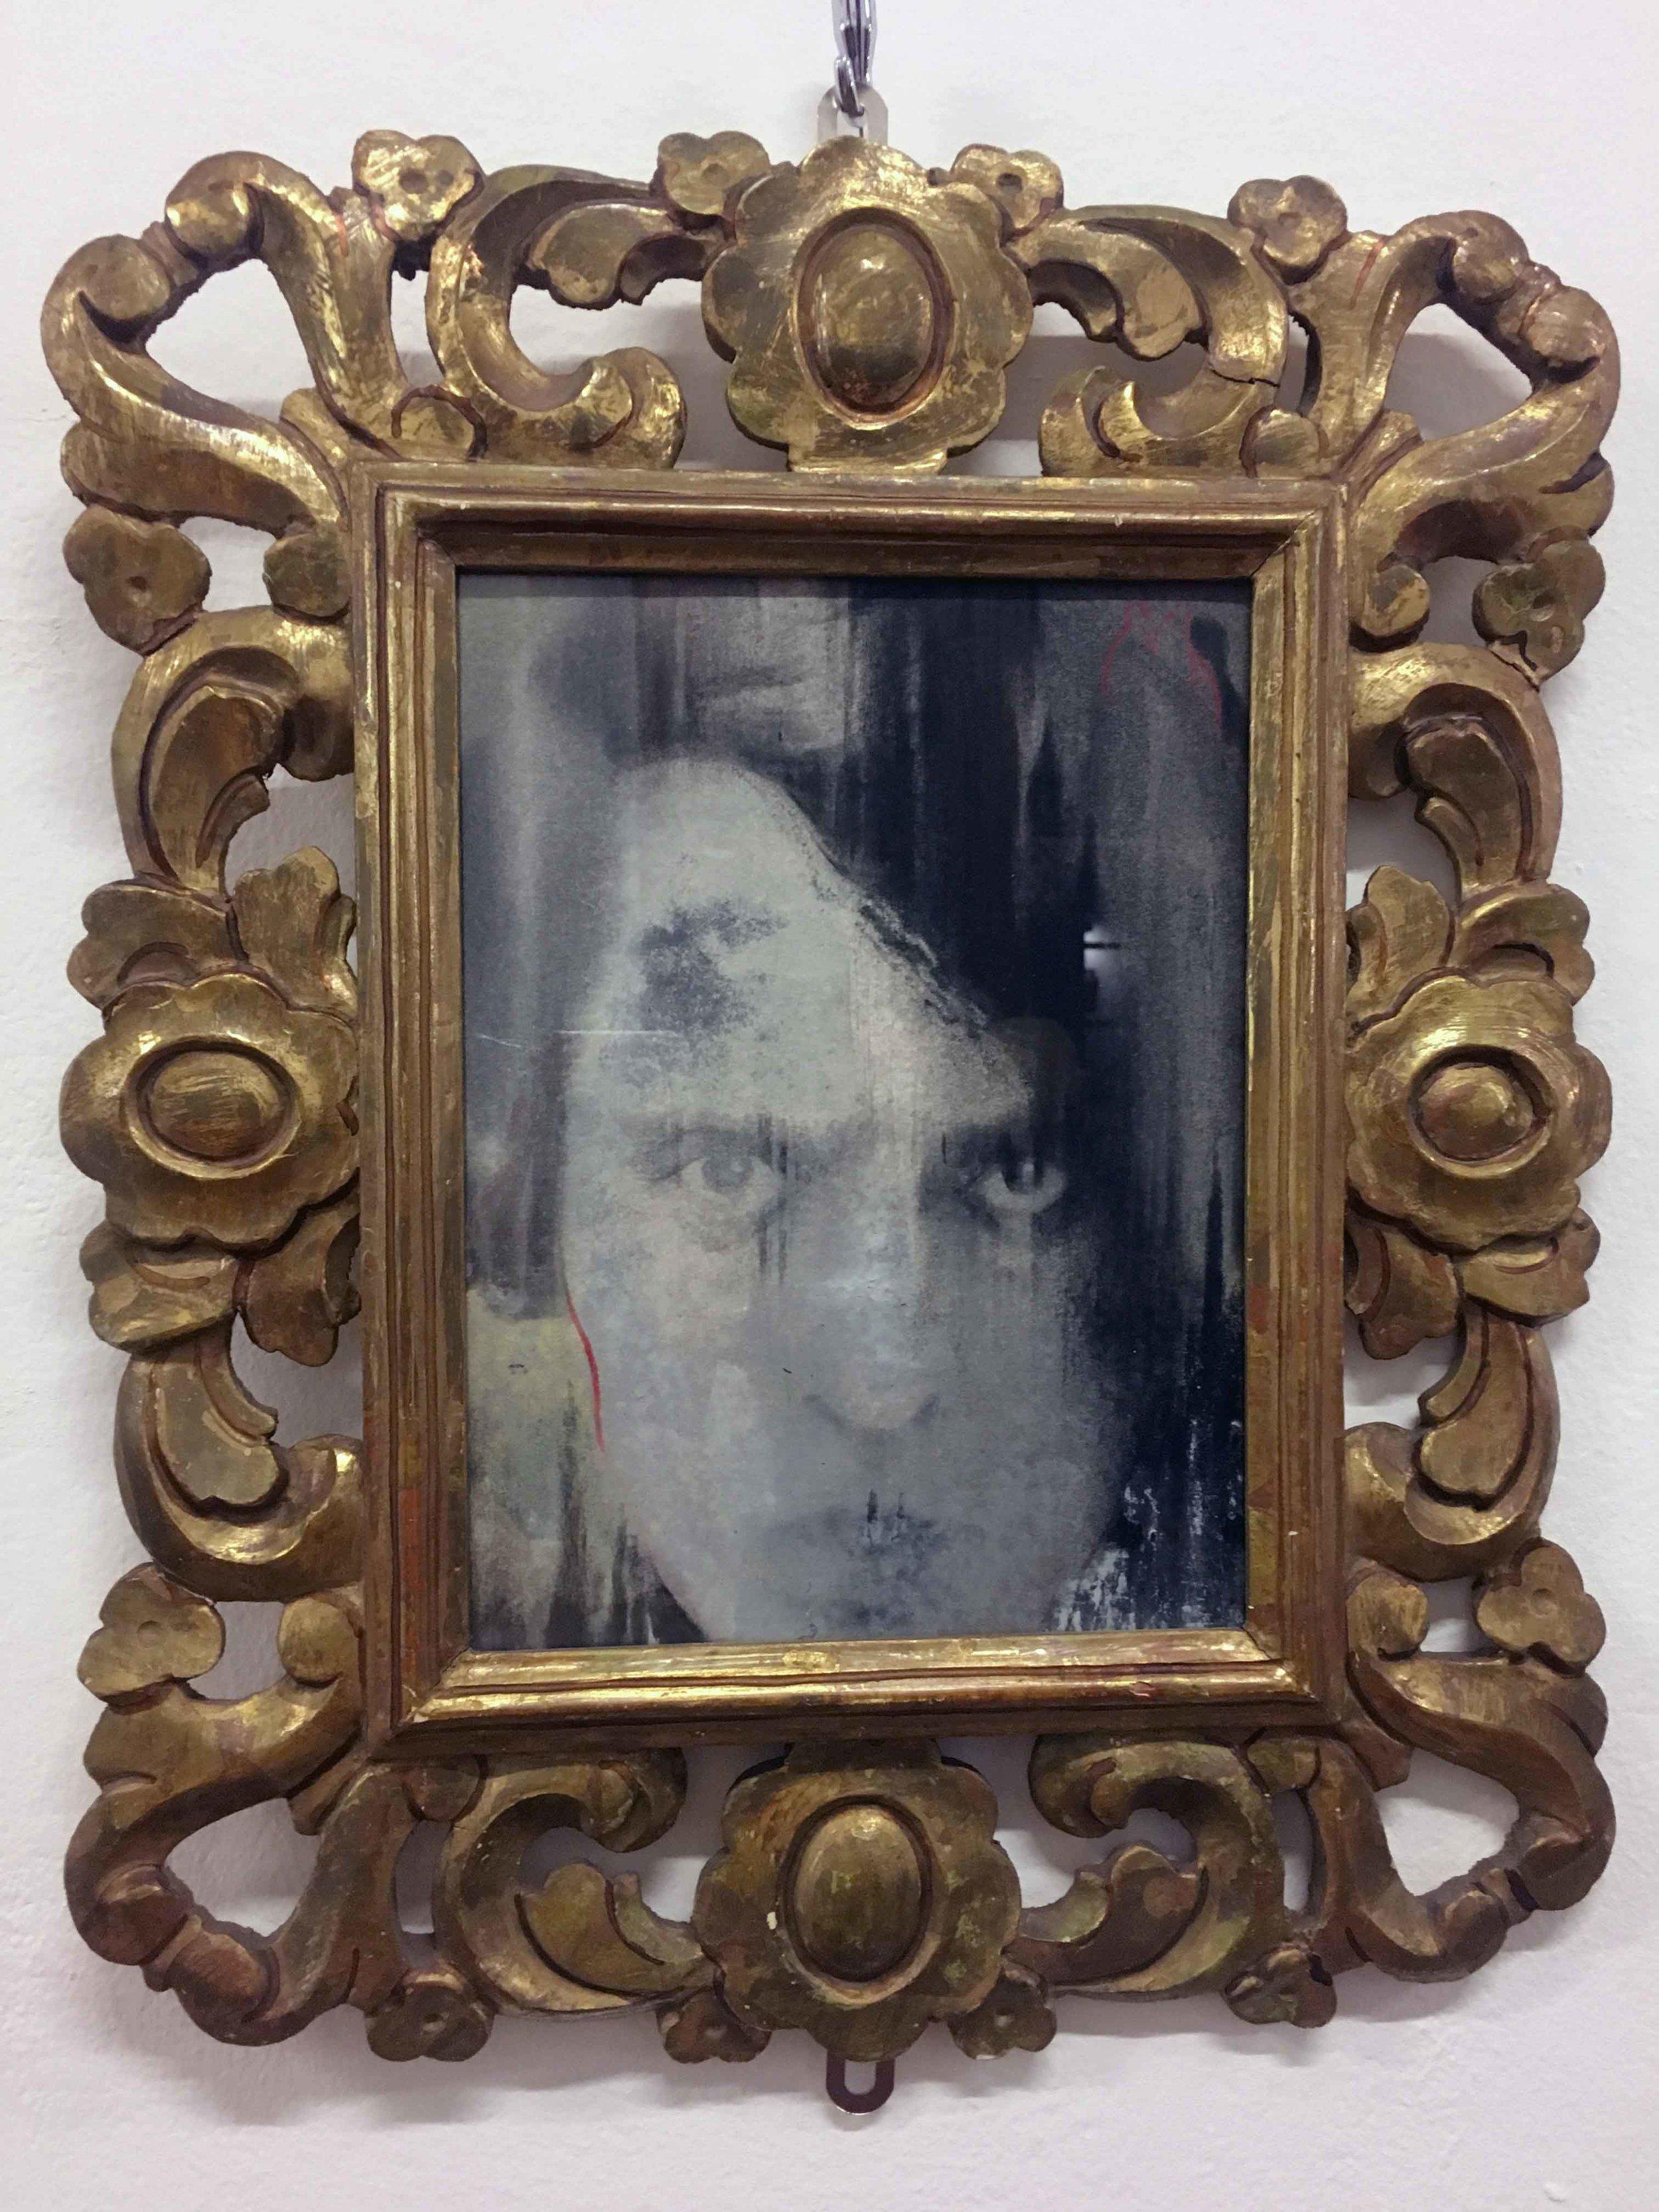 3-maf-2018-eldevenir-art-gallery-galeria-arte-online-maria-bueno-jose-luis-puche-ateneo.jpg